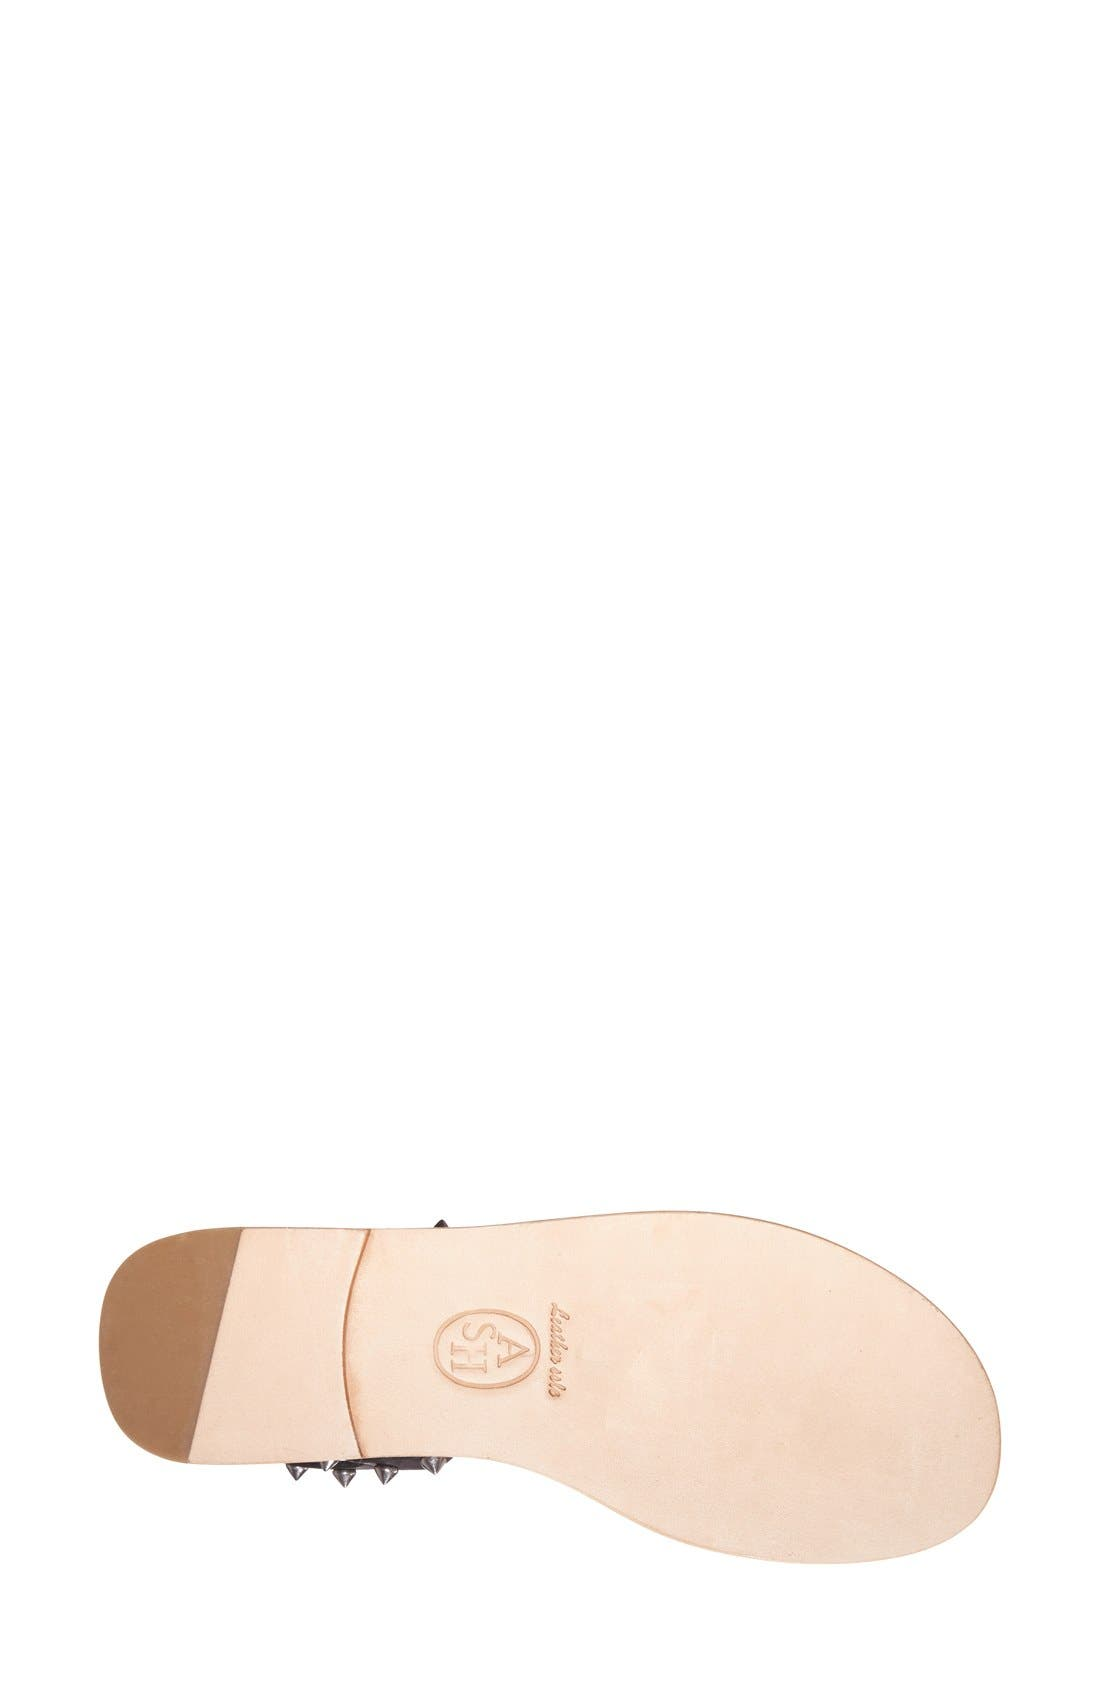 'Pearl' Studded Leather Sandal,                             Alternate thumbnail 4, color,                             Black/ Black